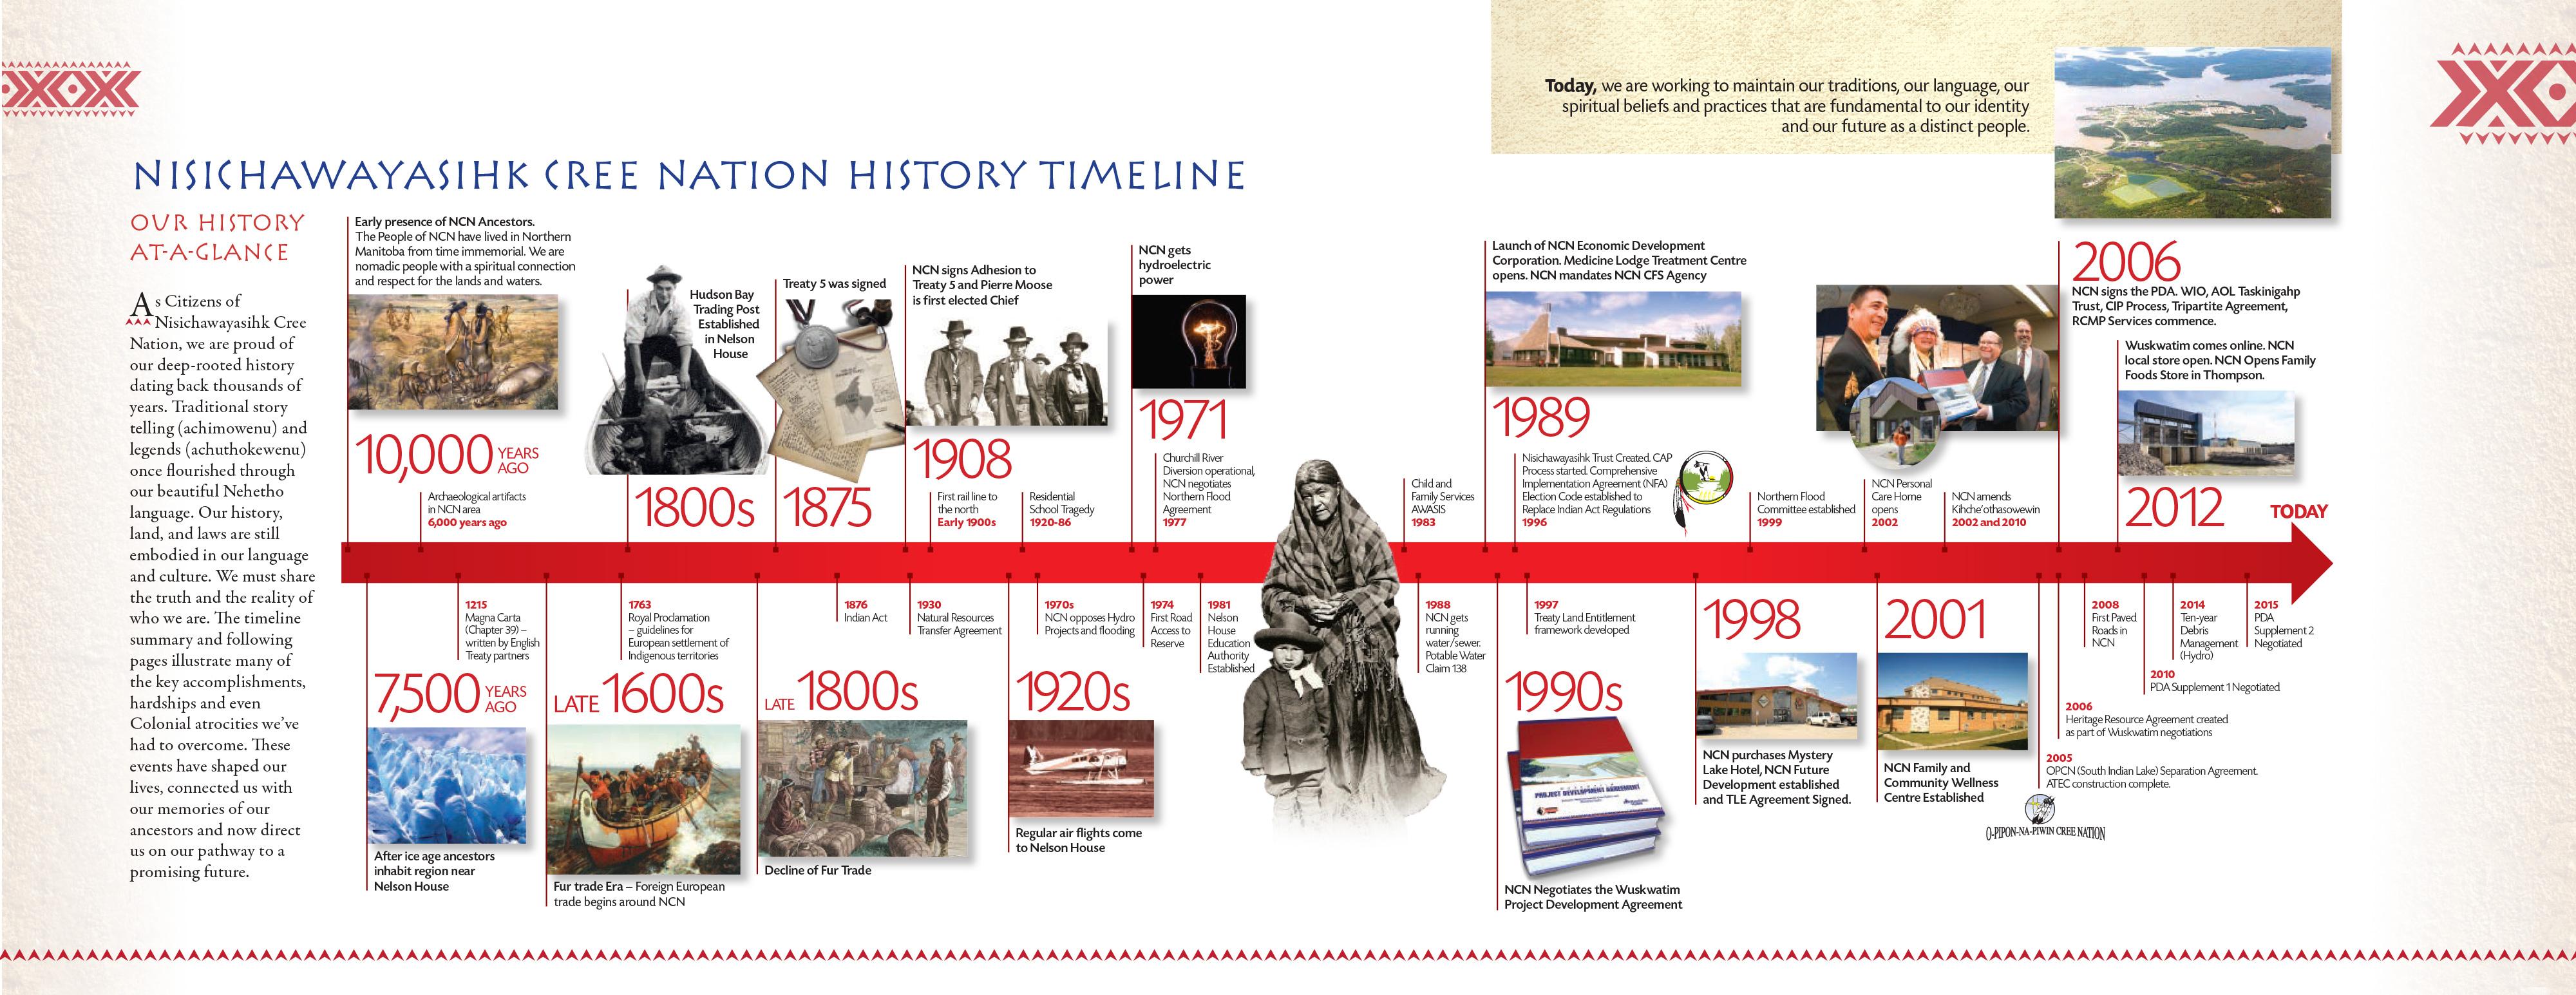 Our History Nisichawayasihk Cree Nation